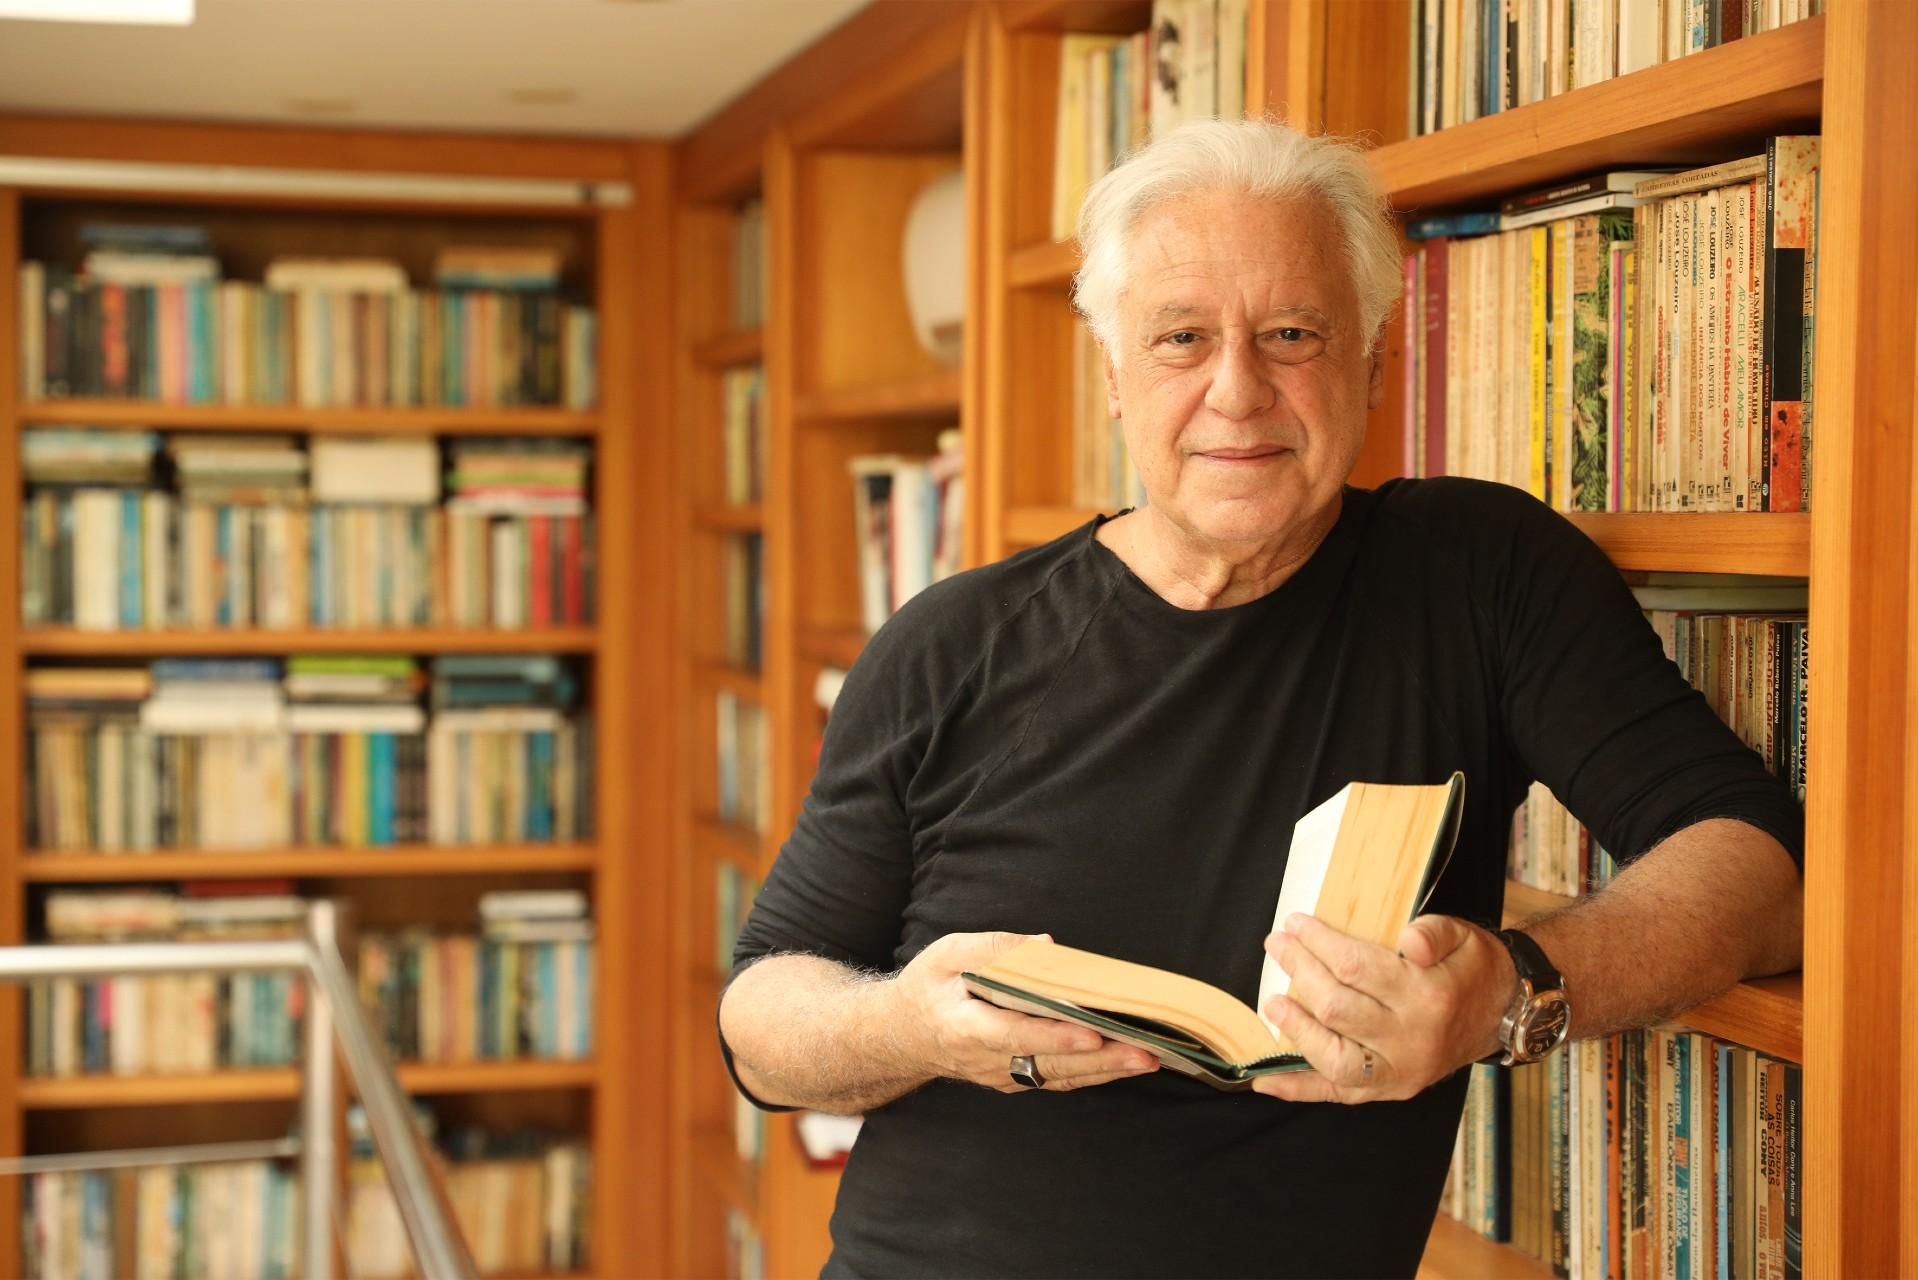 Ator Antonio Fagundes